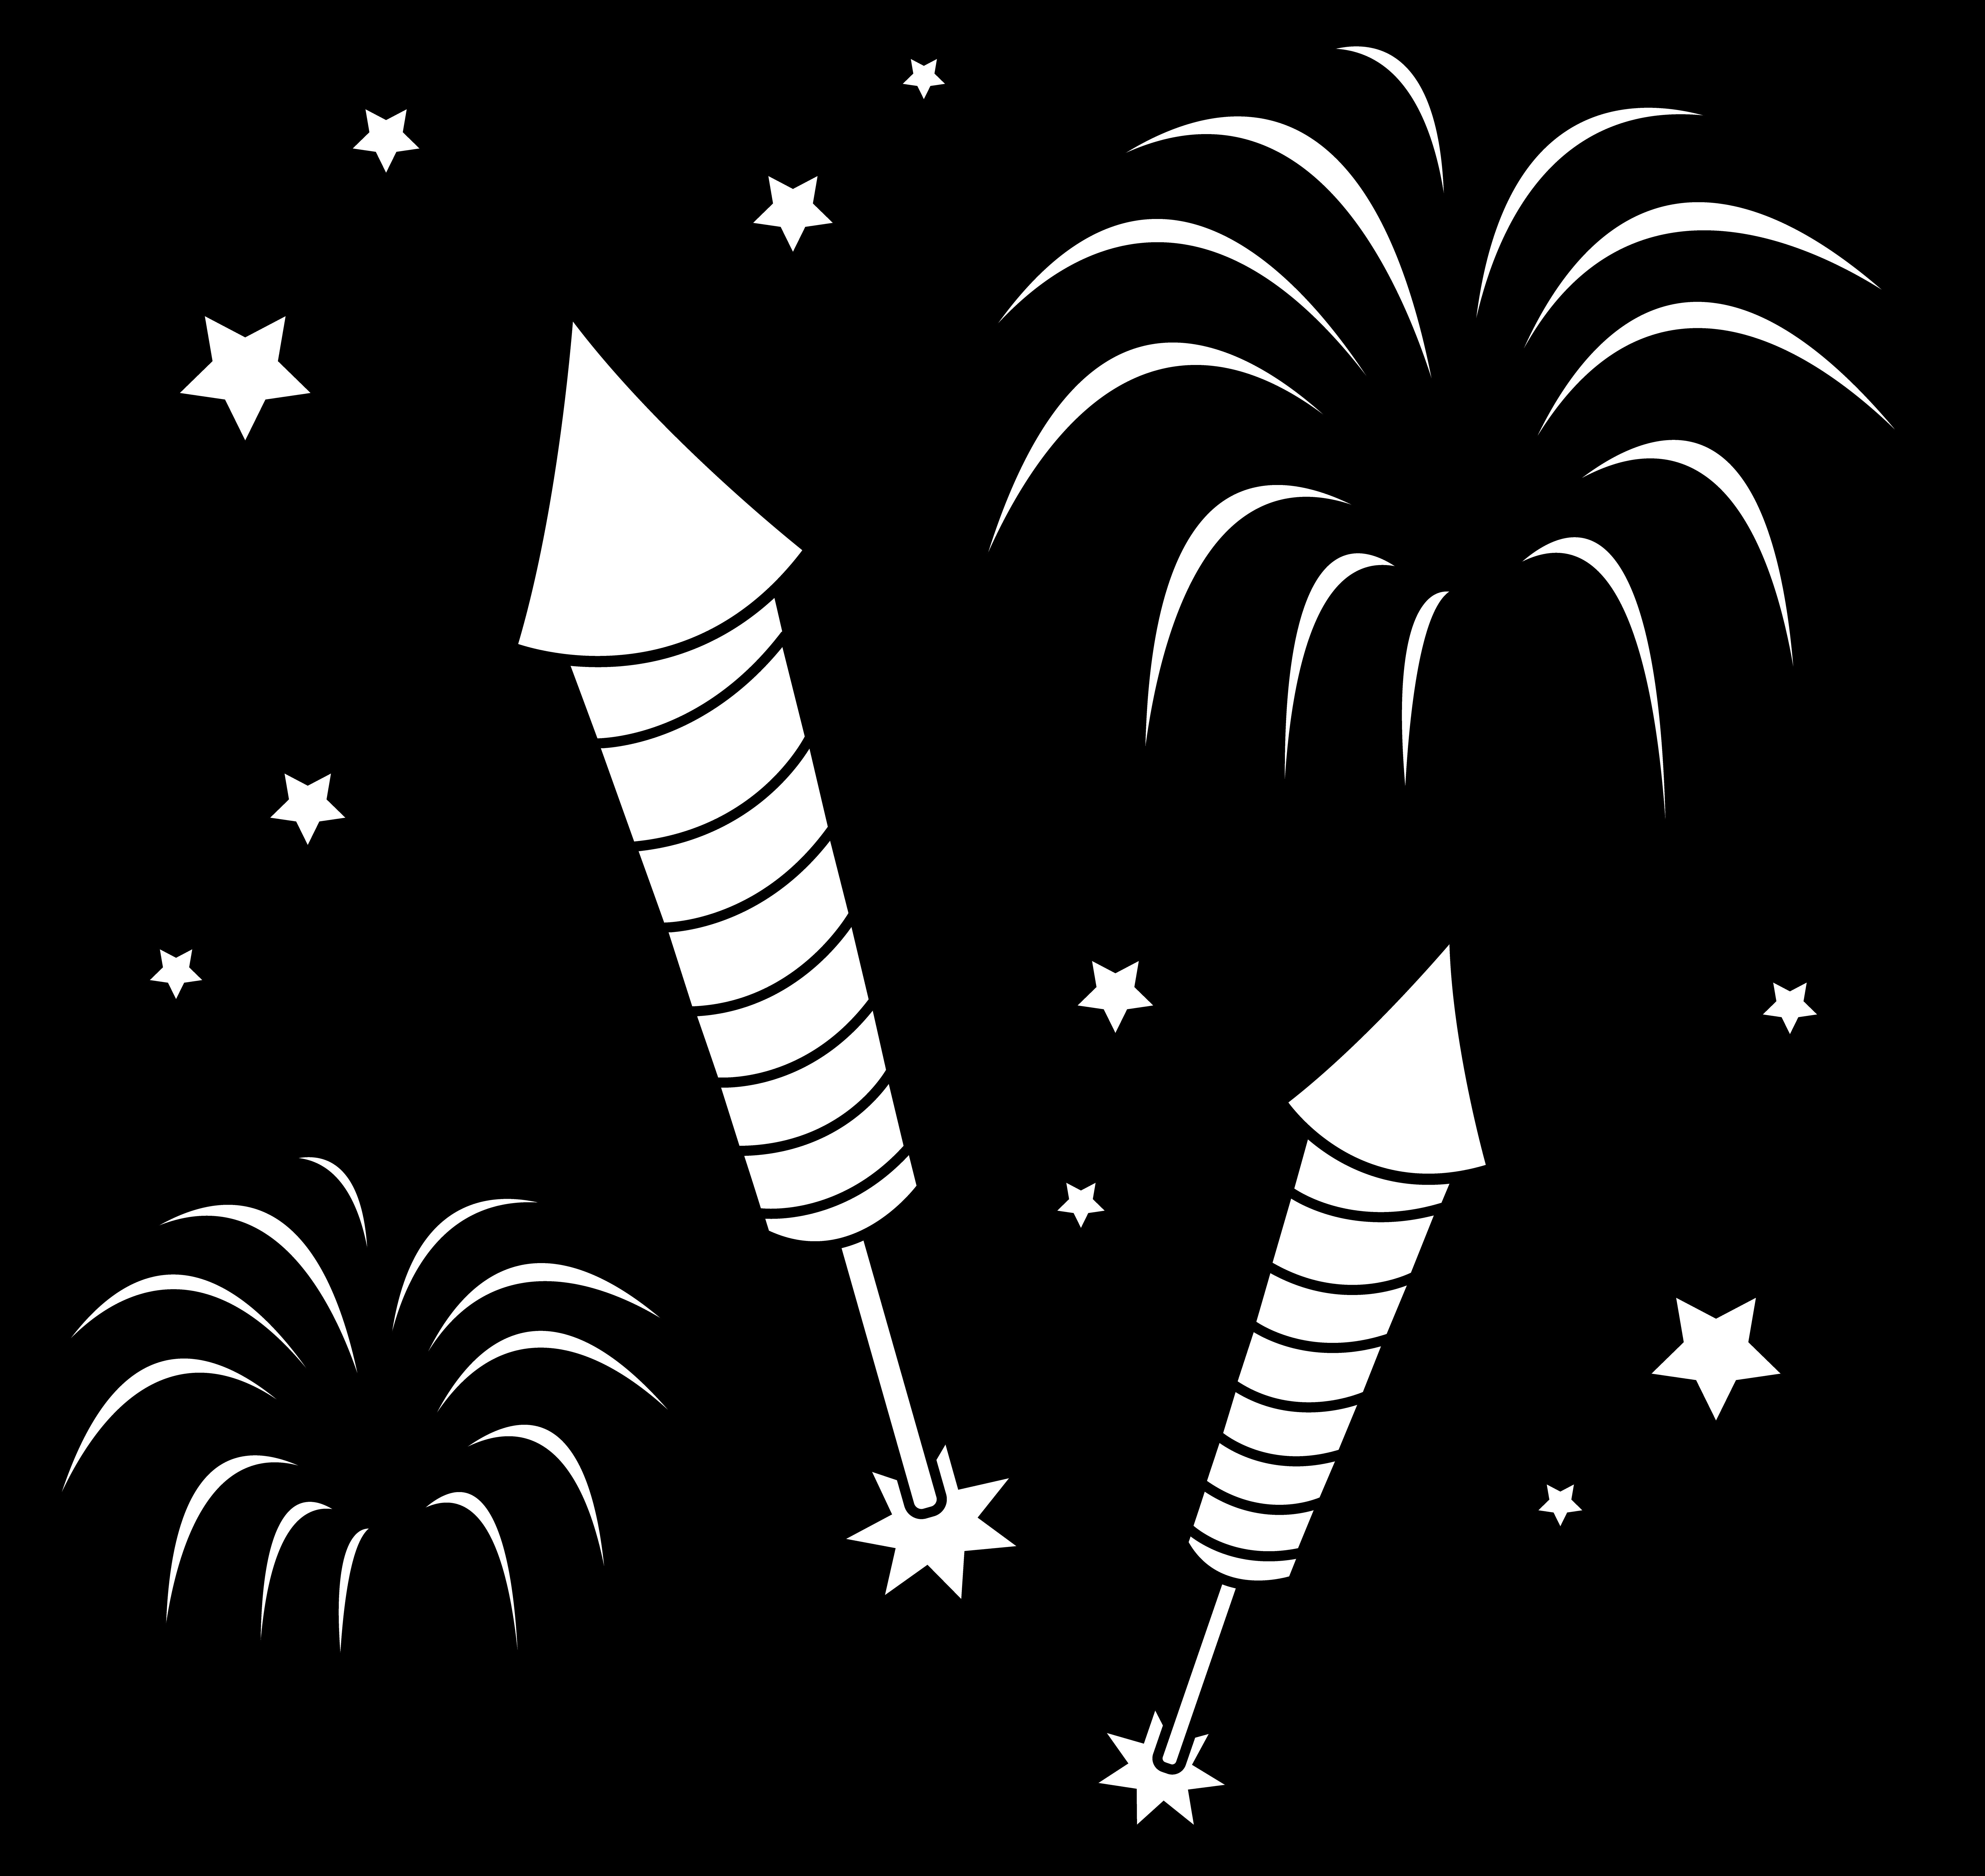 Exelent firework coloring pages. Firecracker clipart bonfire night